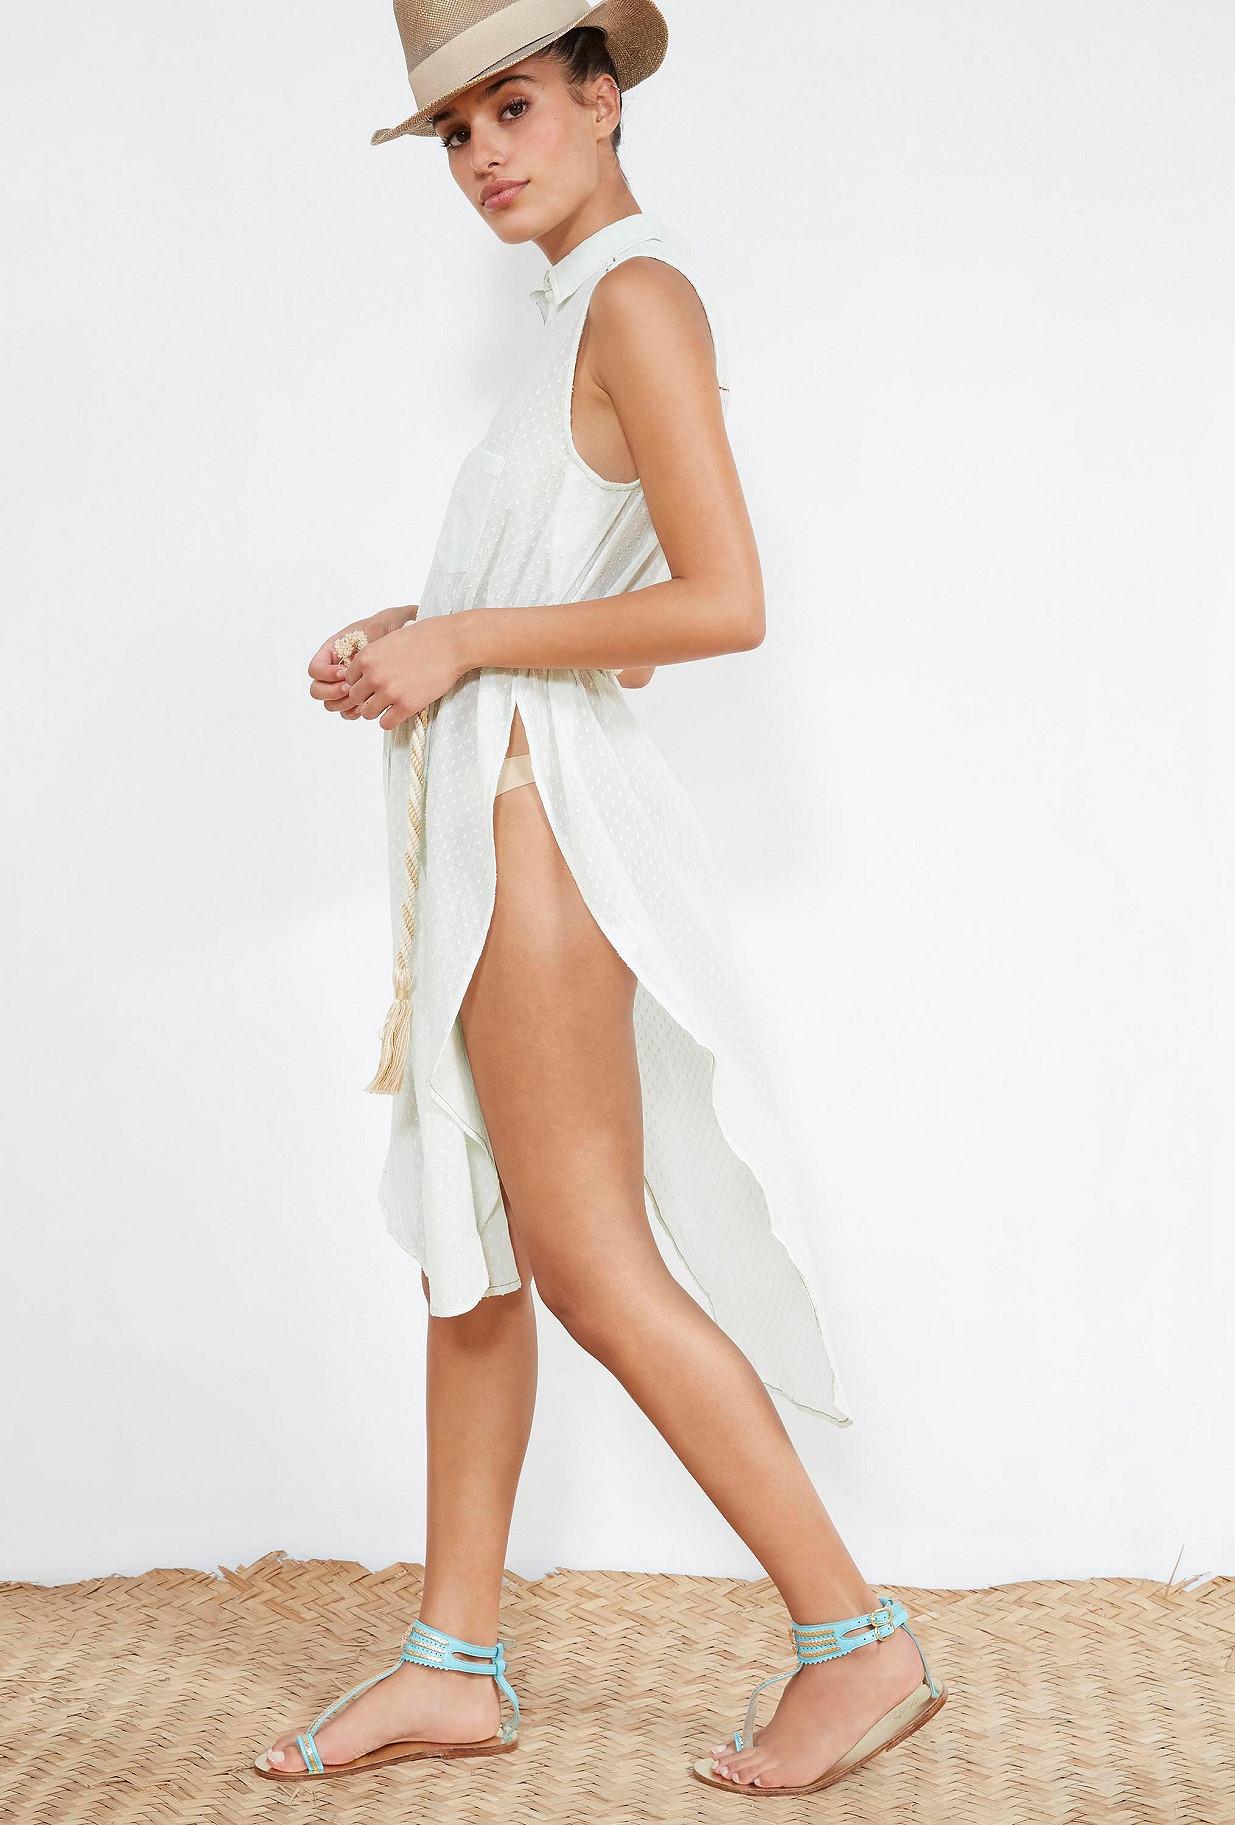 Aqua  SHIRT  Fin Mes demoiselles fashion clothes designer Paris